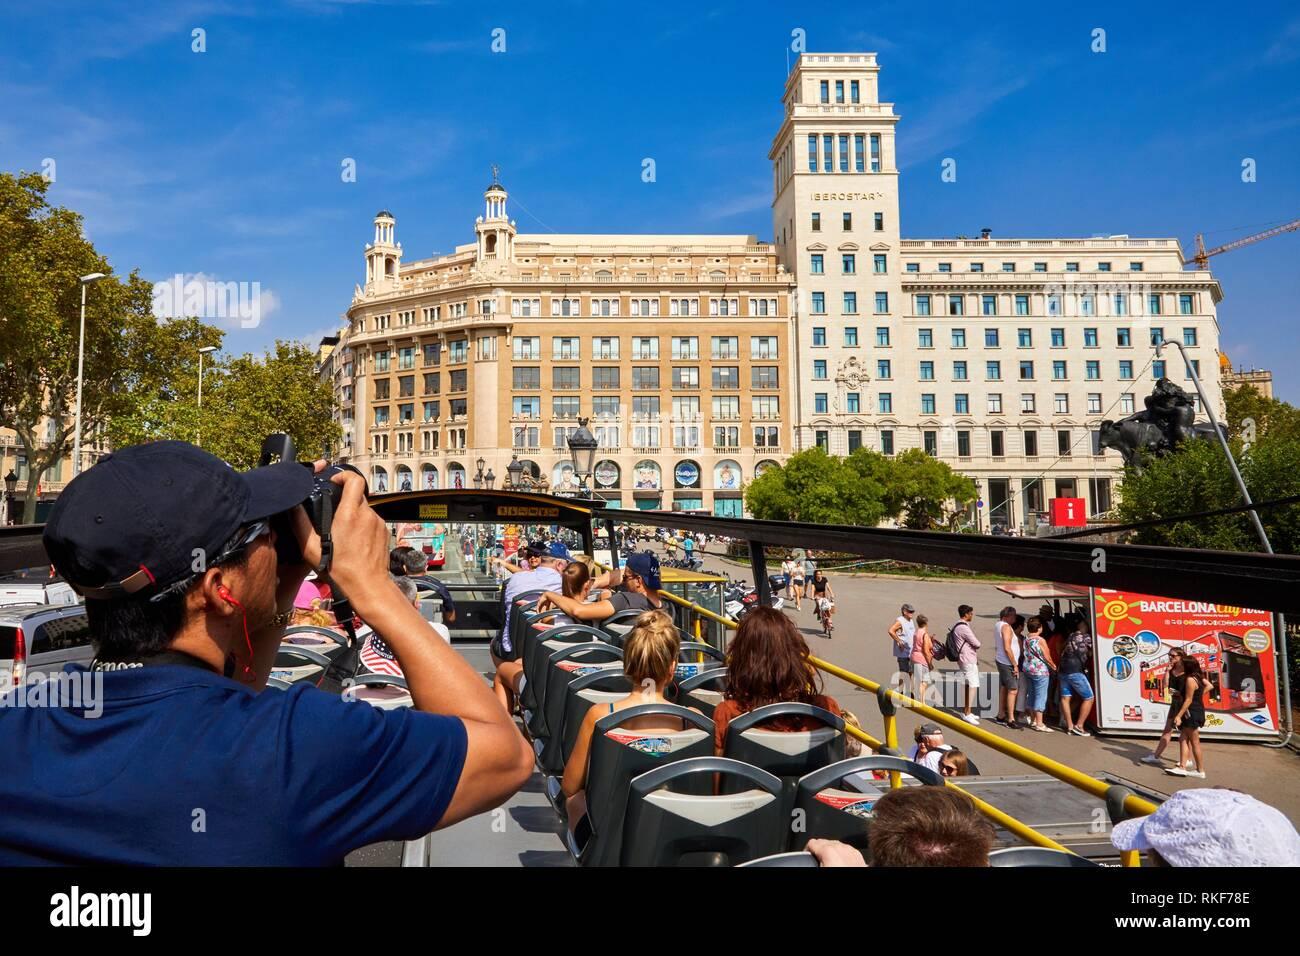 Touristen auf Bus, City Tour, Plaça de Catalunya, Barcelona, Katalonien, Spanien, Europa Stockbild